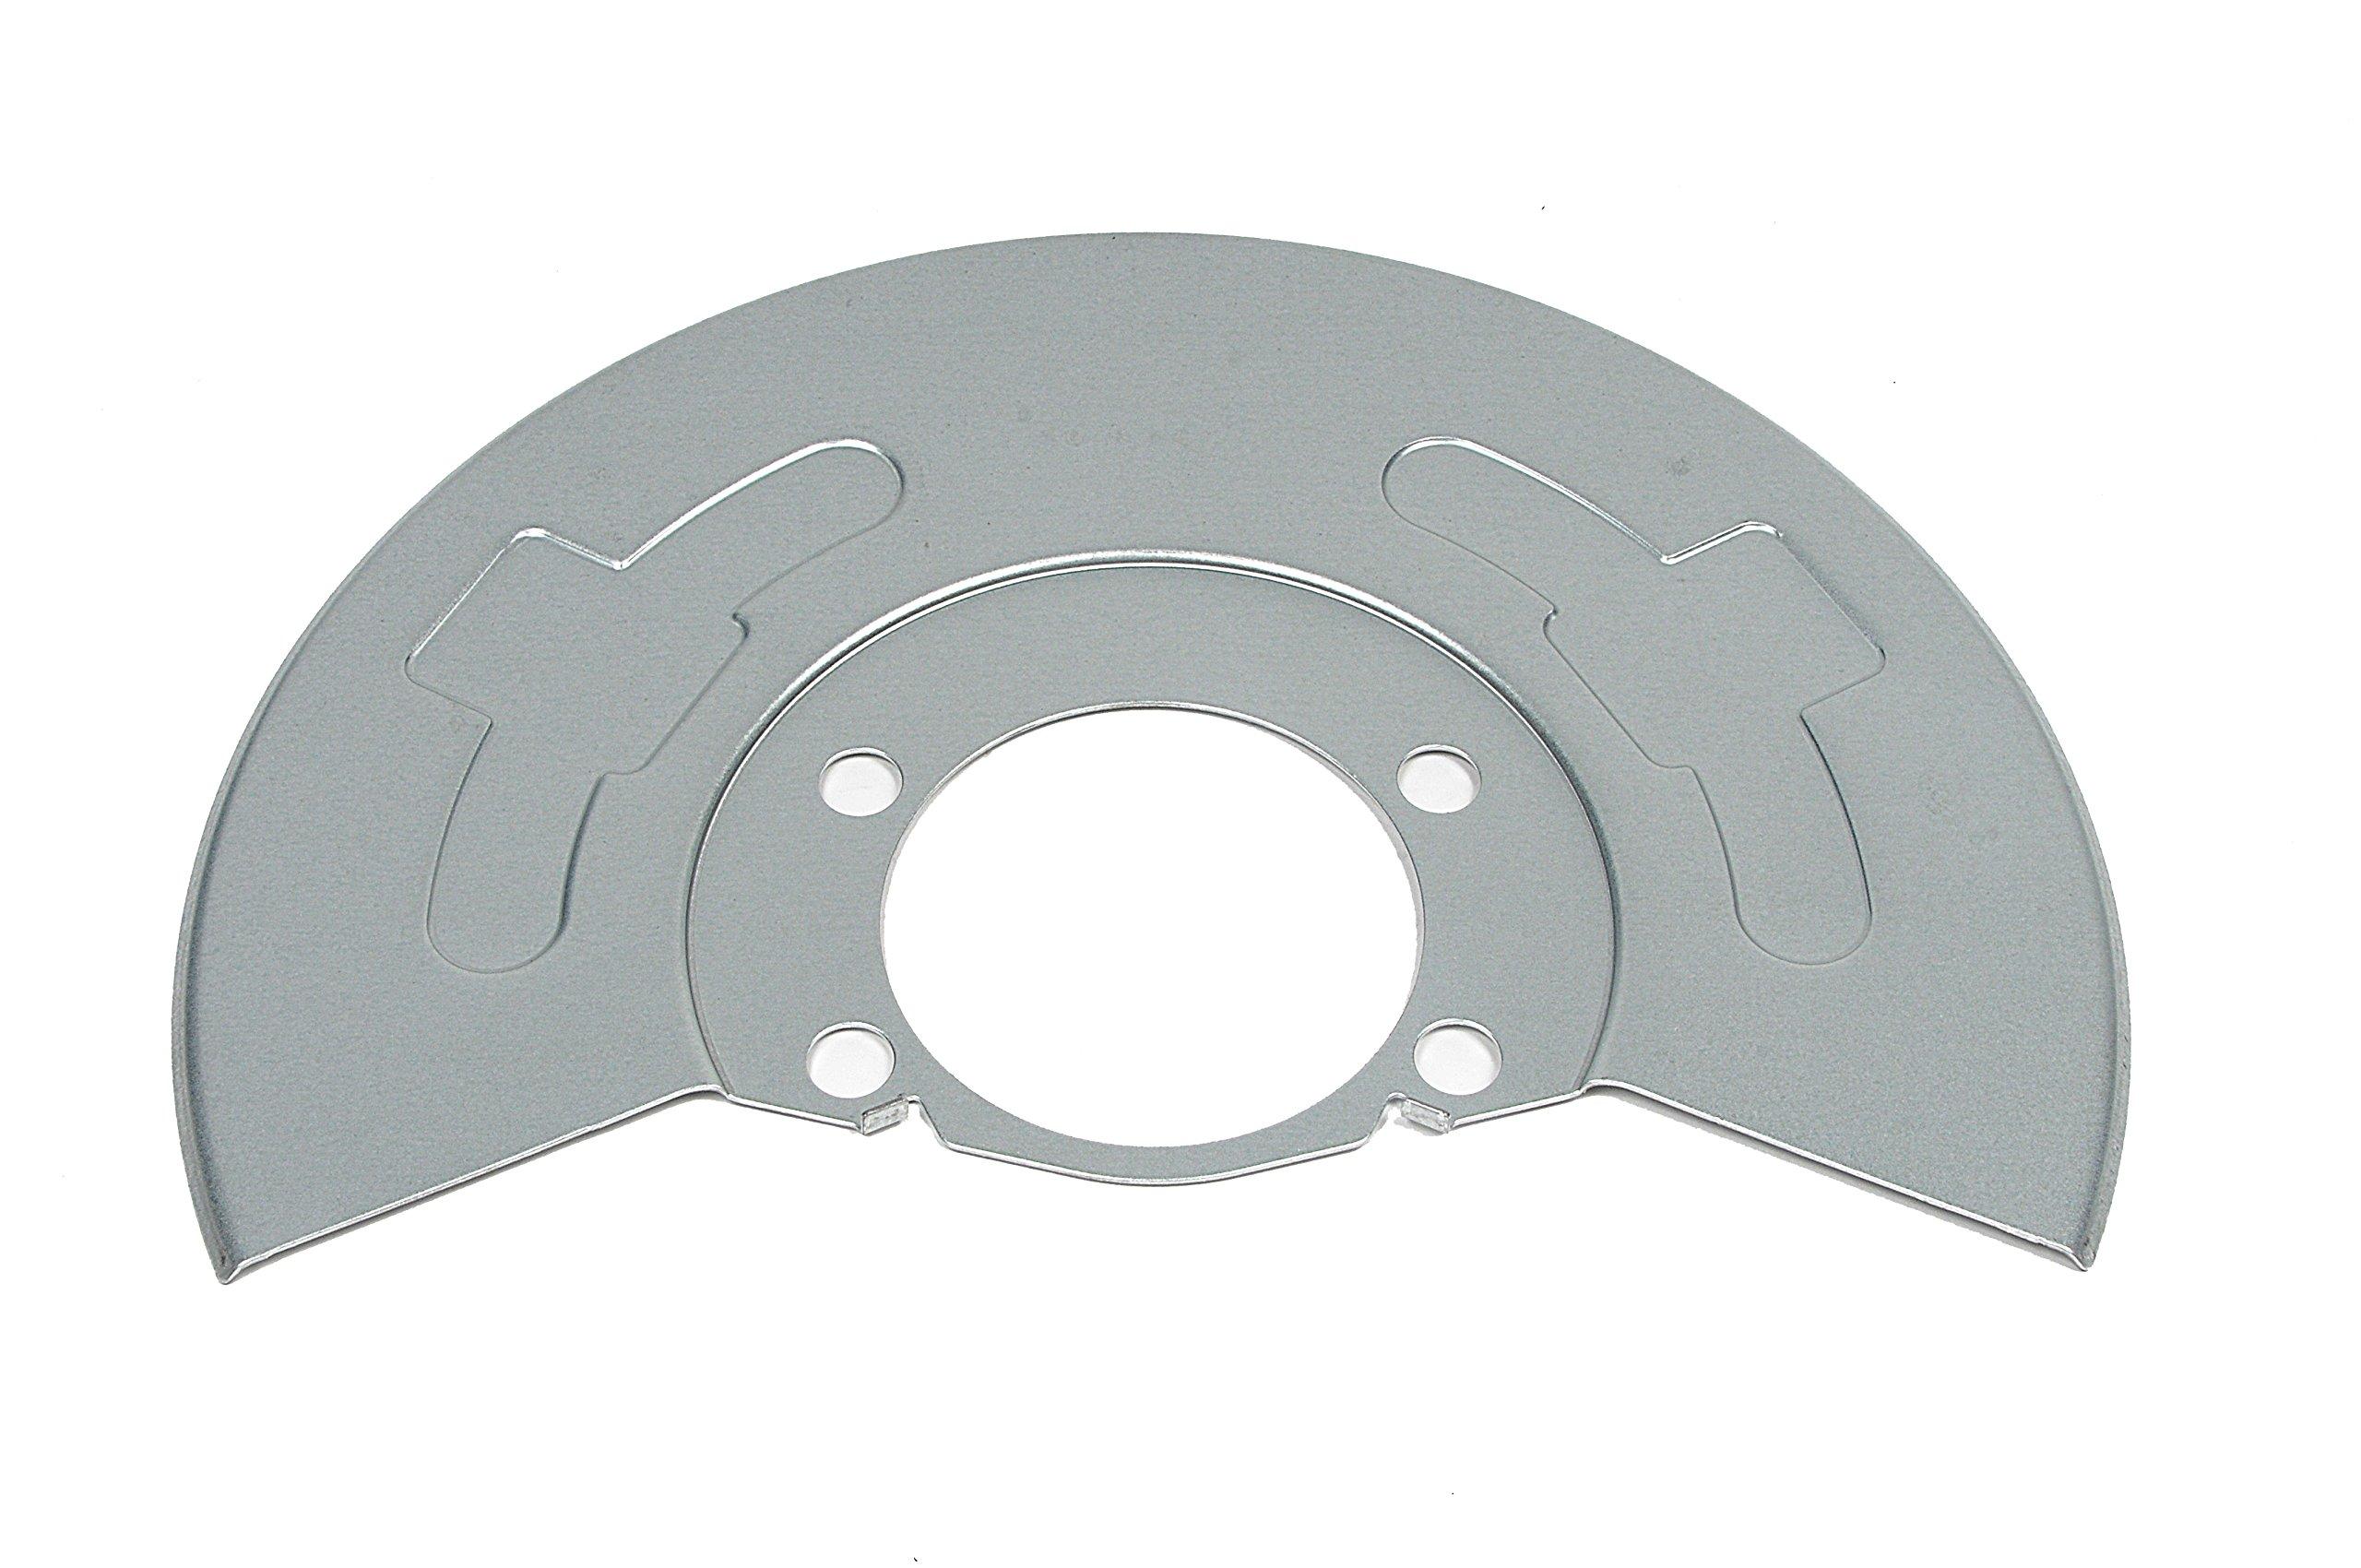 ACDelco 25832145 GM Original Equipment Front Brake Dust Shield